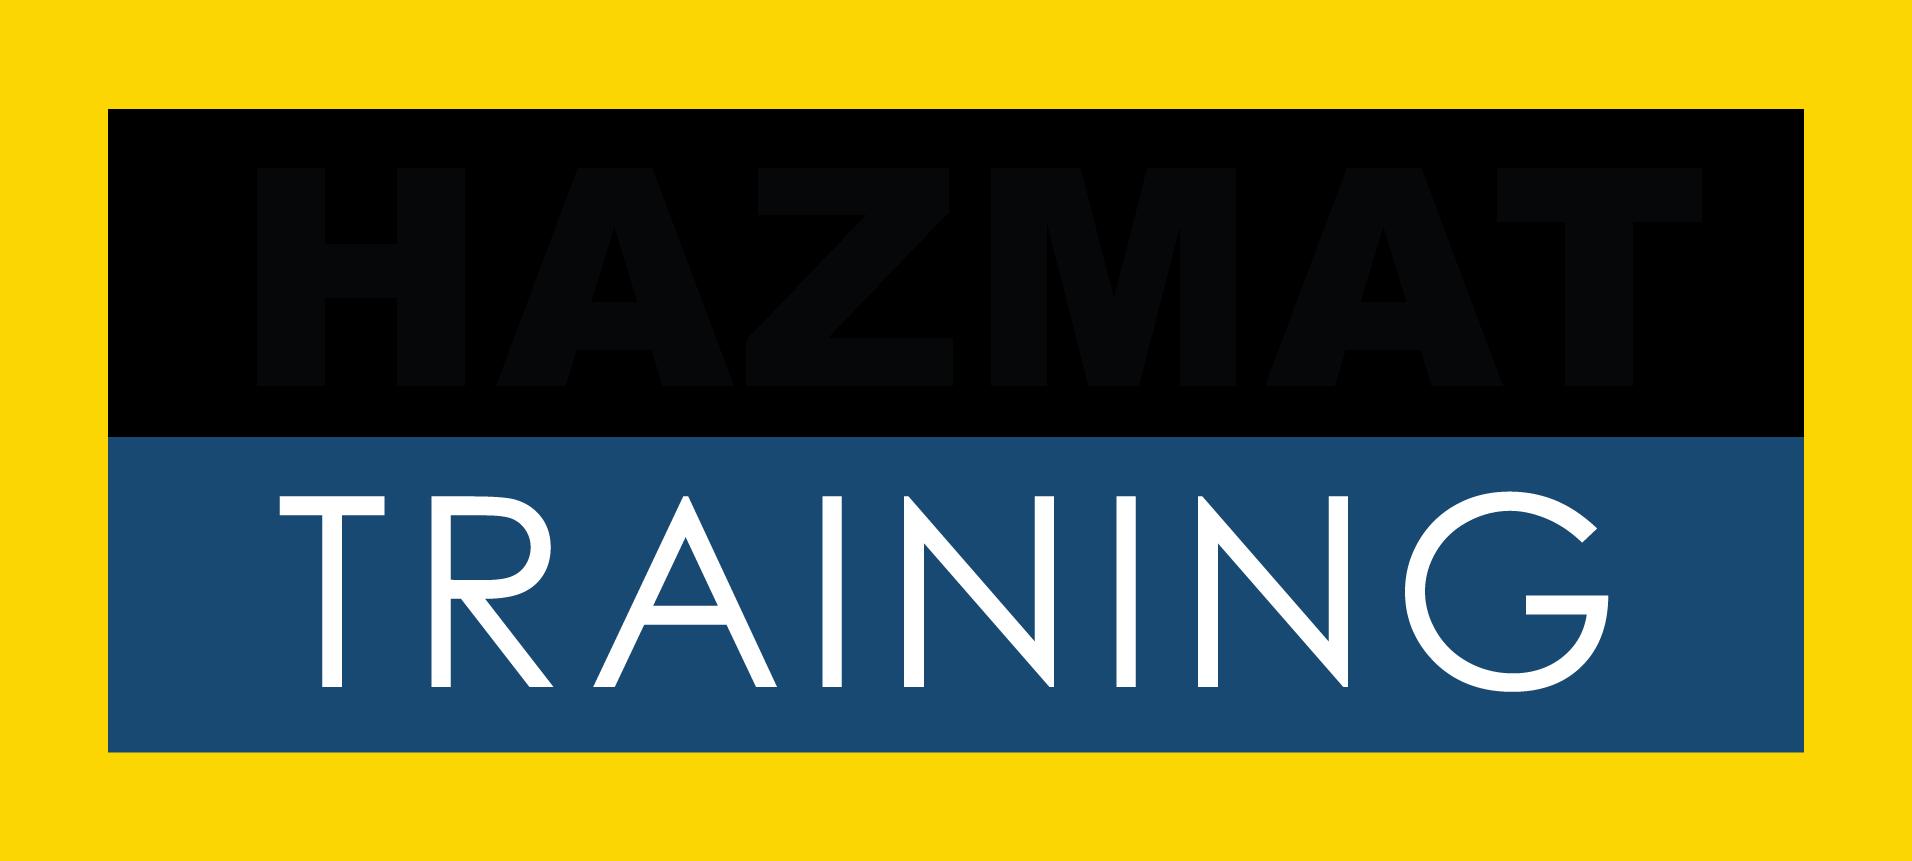 Hazmat Training - Course Catalog